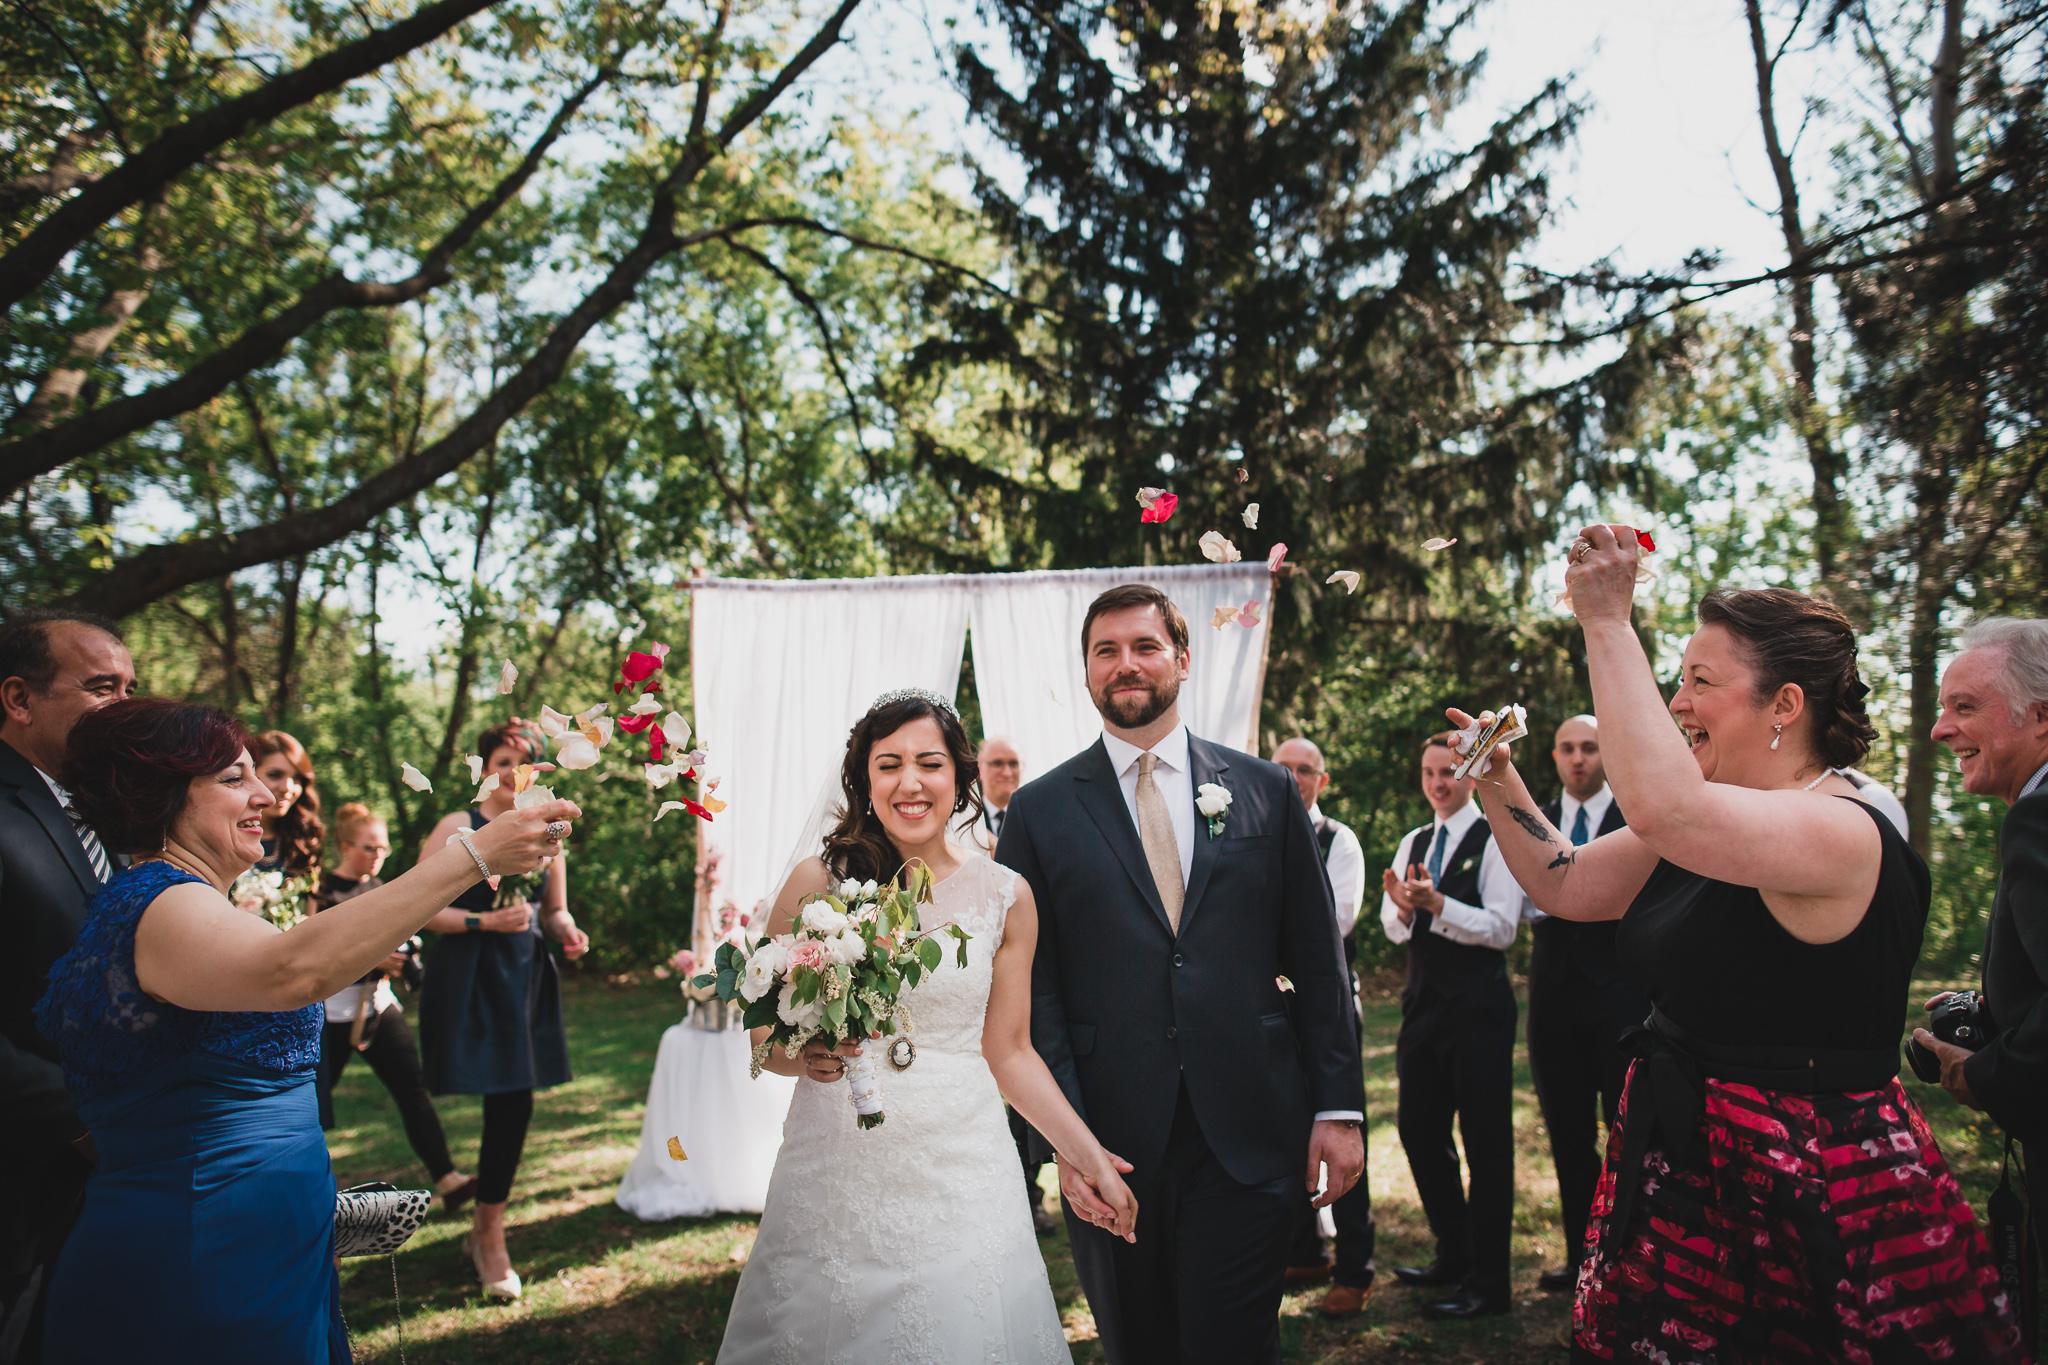 Ottawa Wedding Photographer Candid and Natural